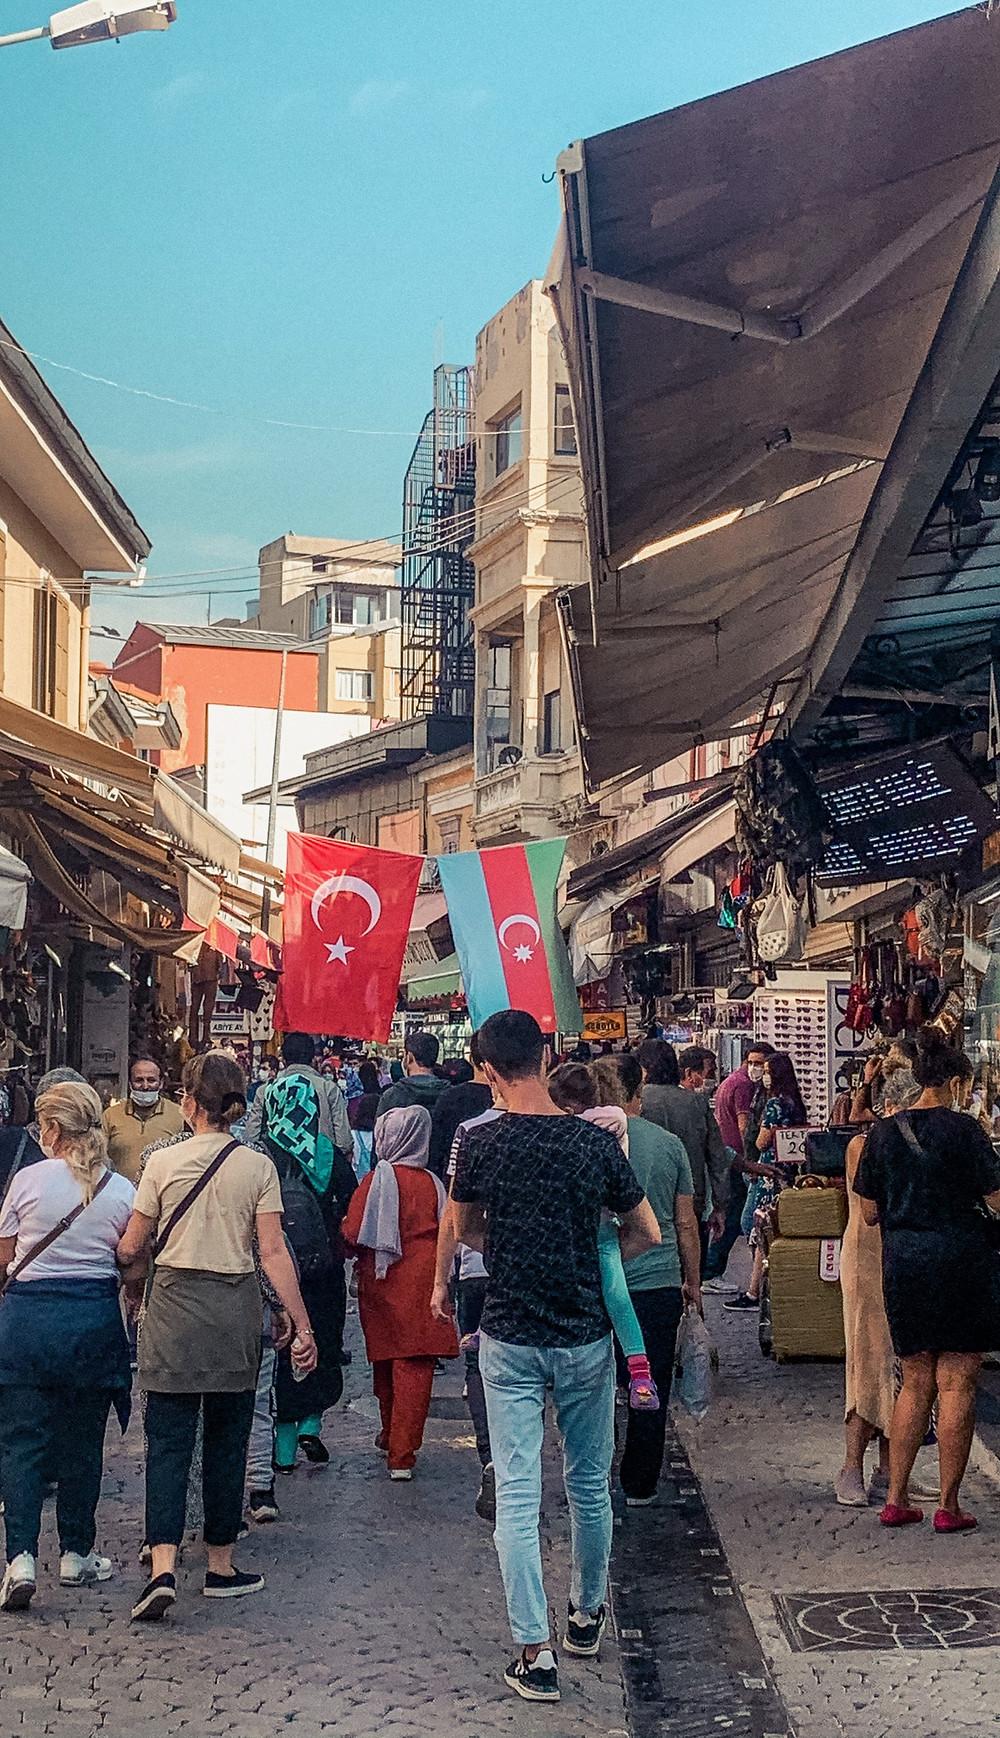 Strolling along a portion of Izmir's Kemeralti Bazaar